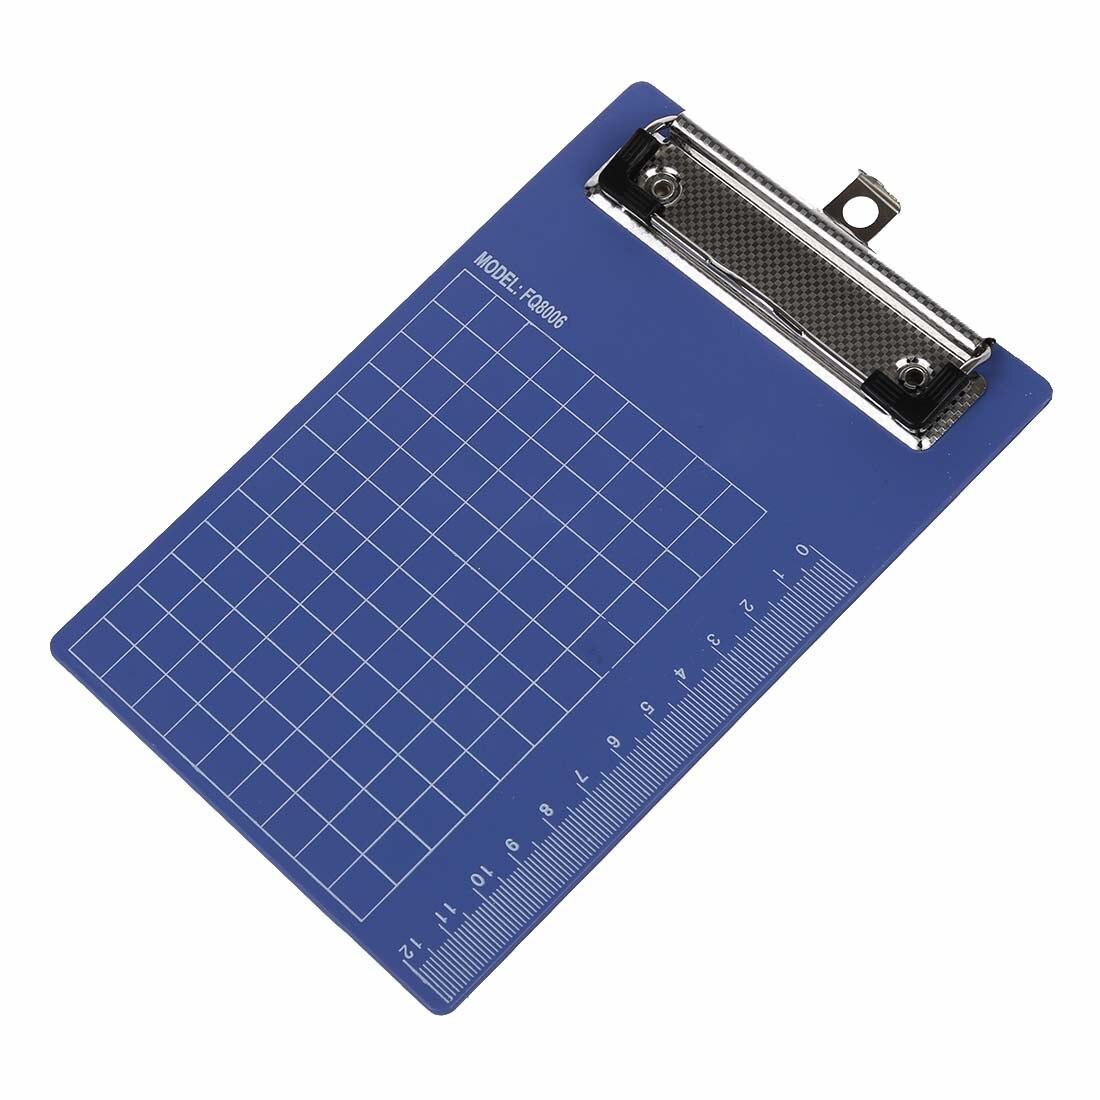 Pad Clip Holder Folder Plastic Clipboard Blue Purple For Paper A6